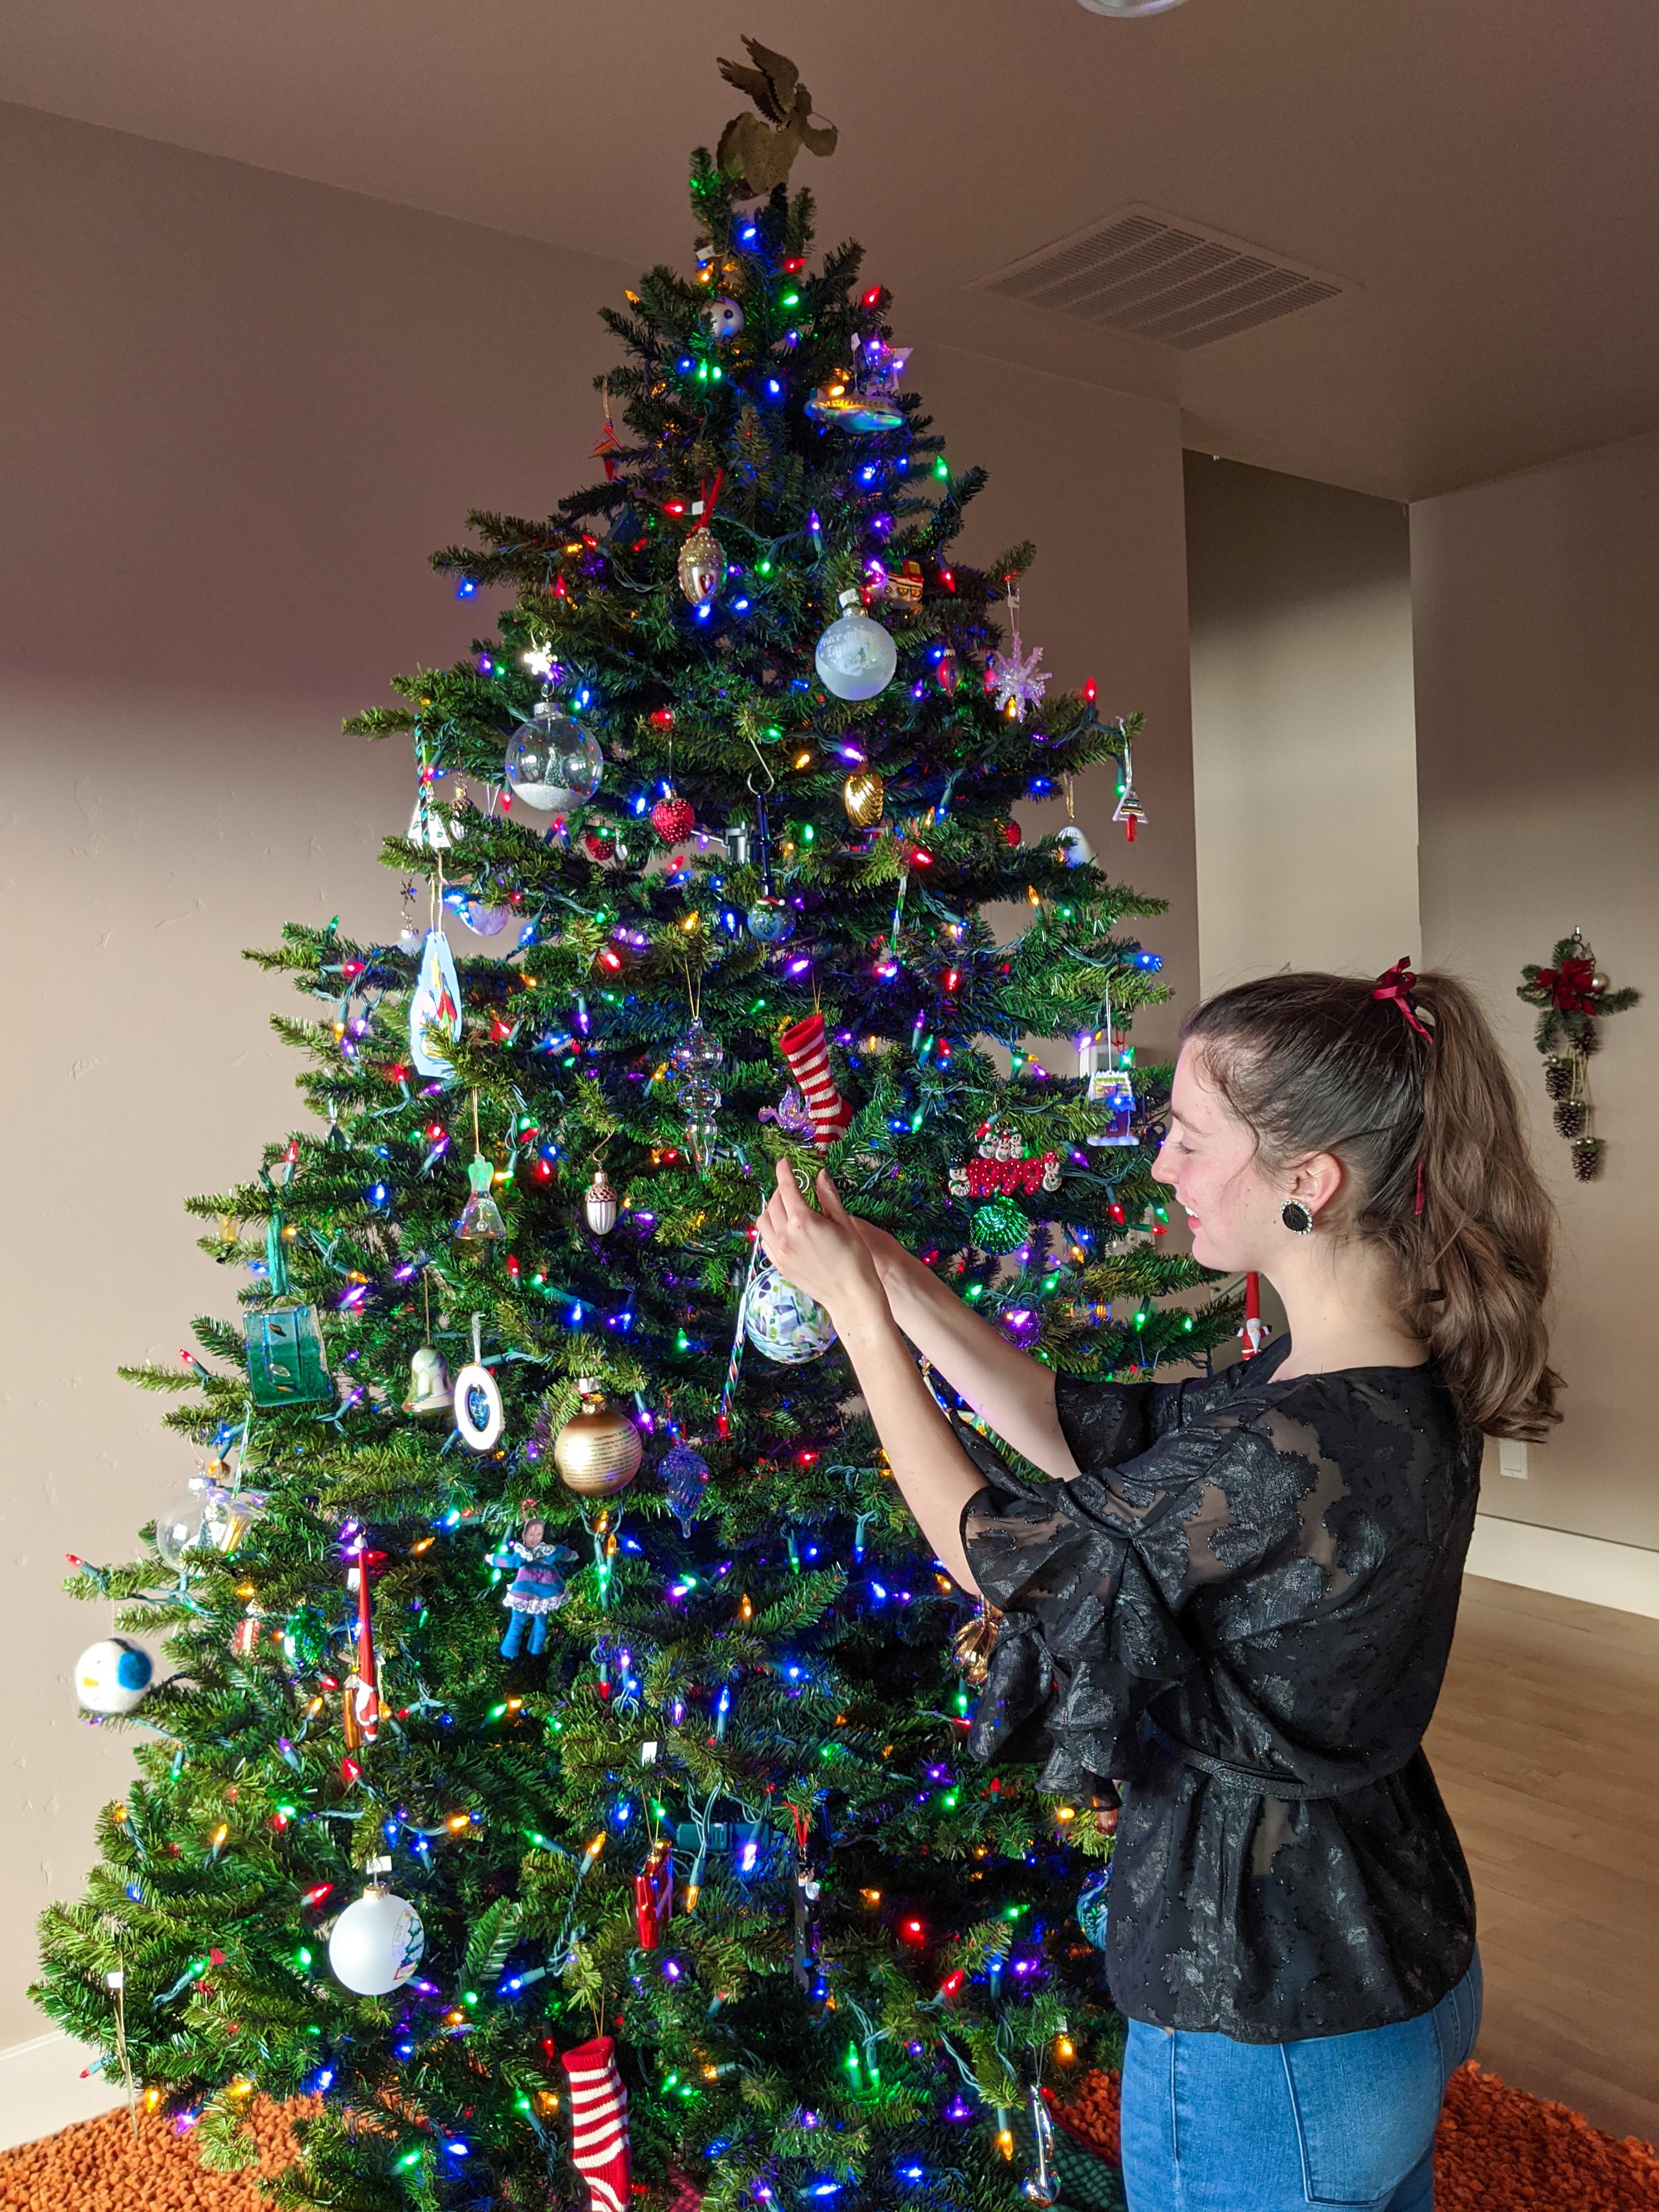 Christmas tree decorating, Christmas tree, ornaments